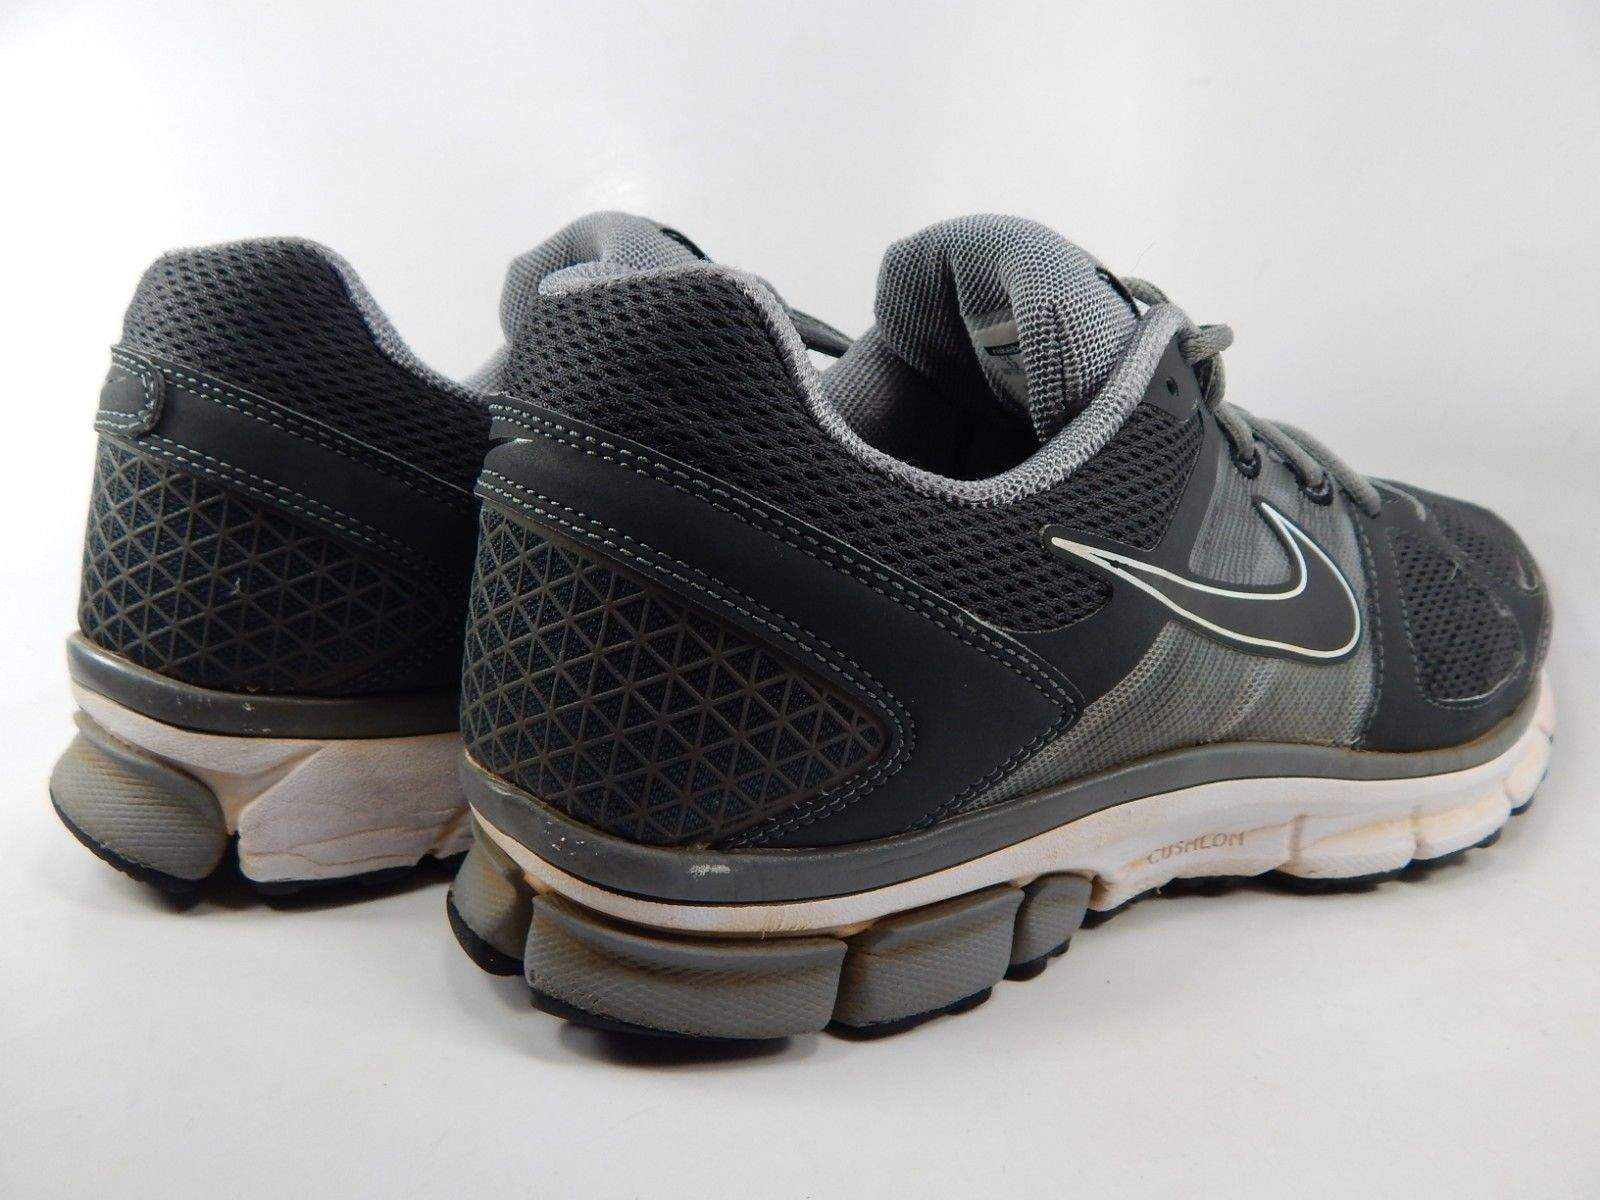 e4c82169d9f3d Nike Air Pegasus+ 28 Size 13 M (D) EU 47.5 Men s Running Shoes Gray